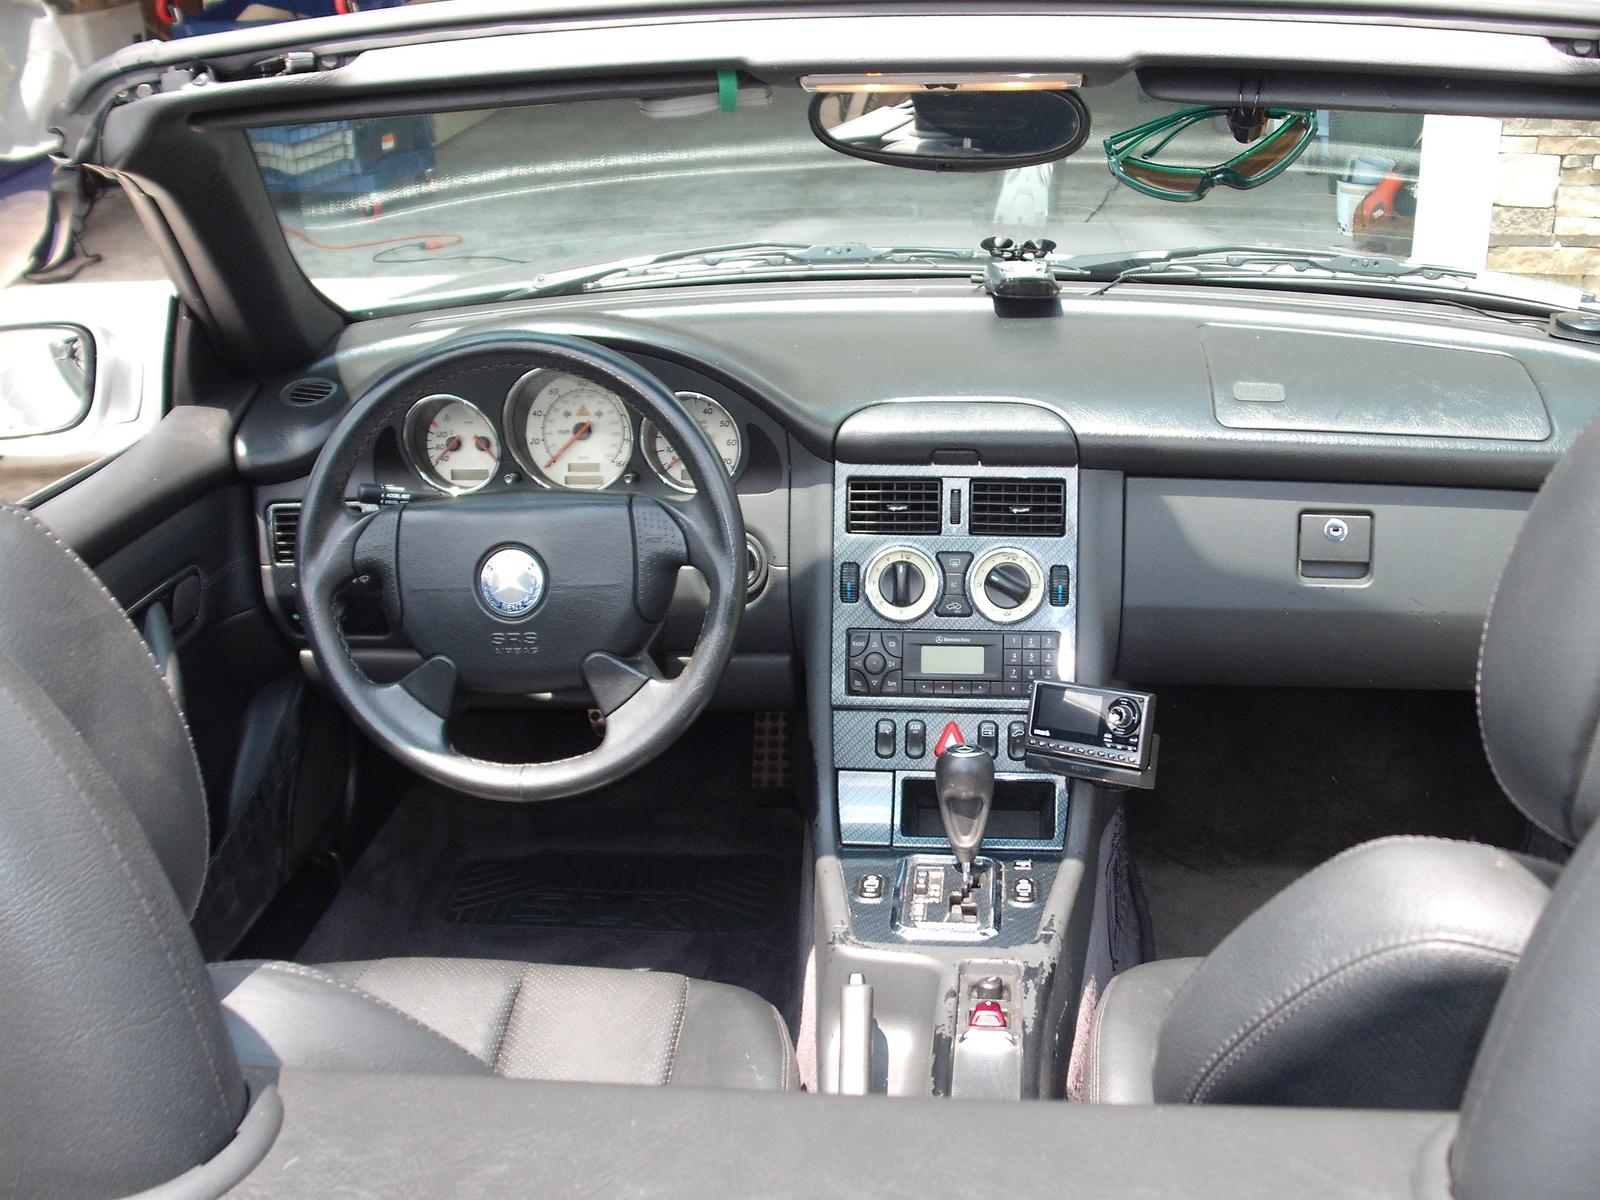 1999 Mercedes Benz Slk Class Interior Pictures Cargurus